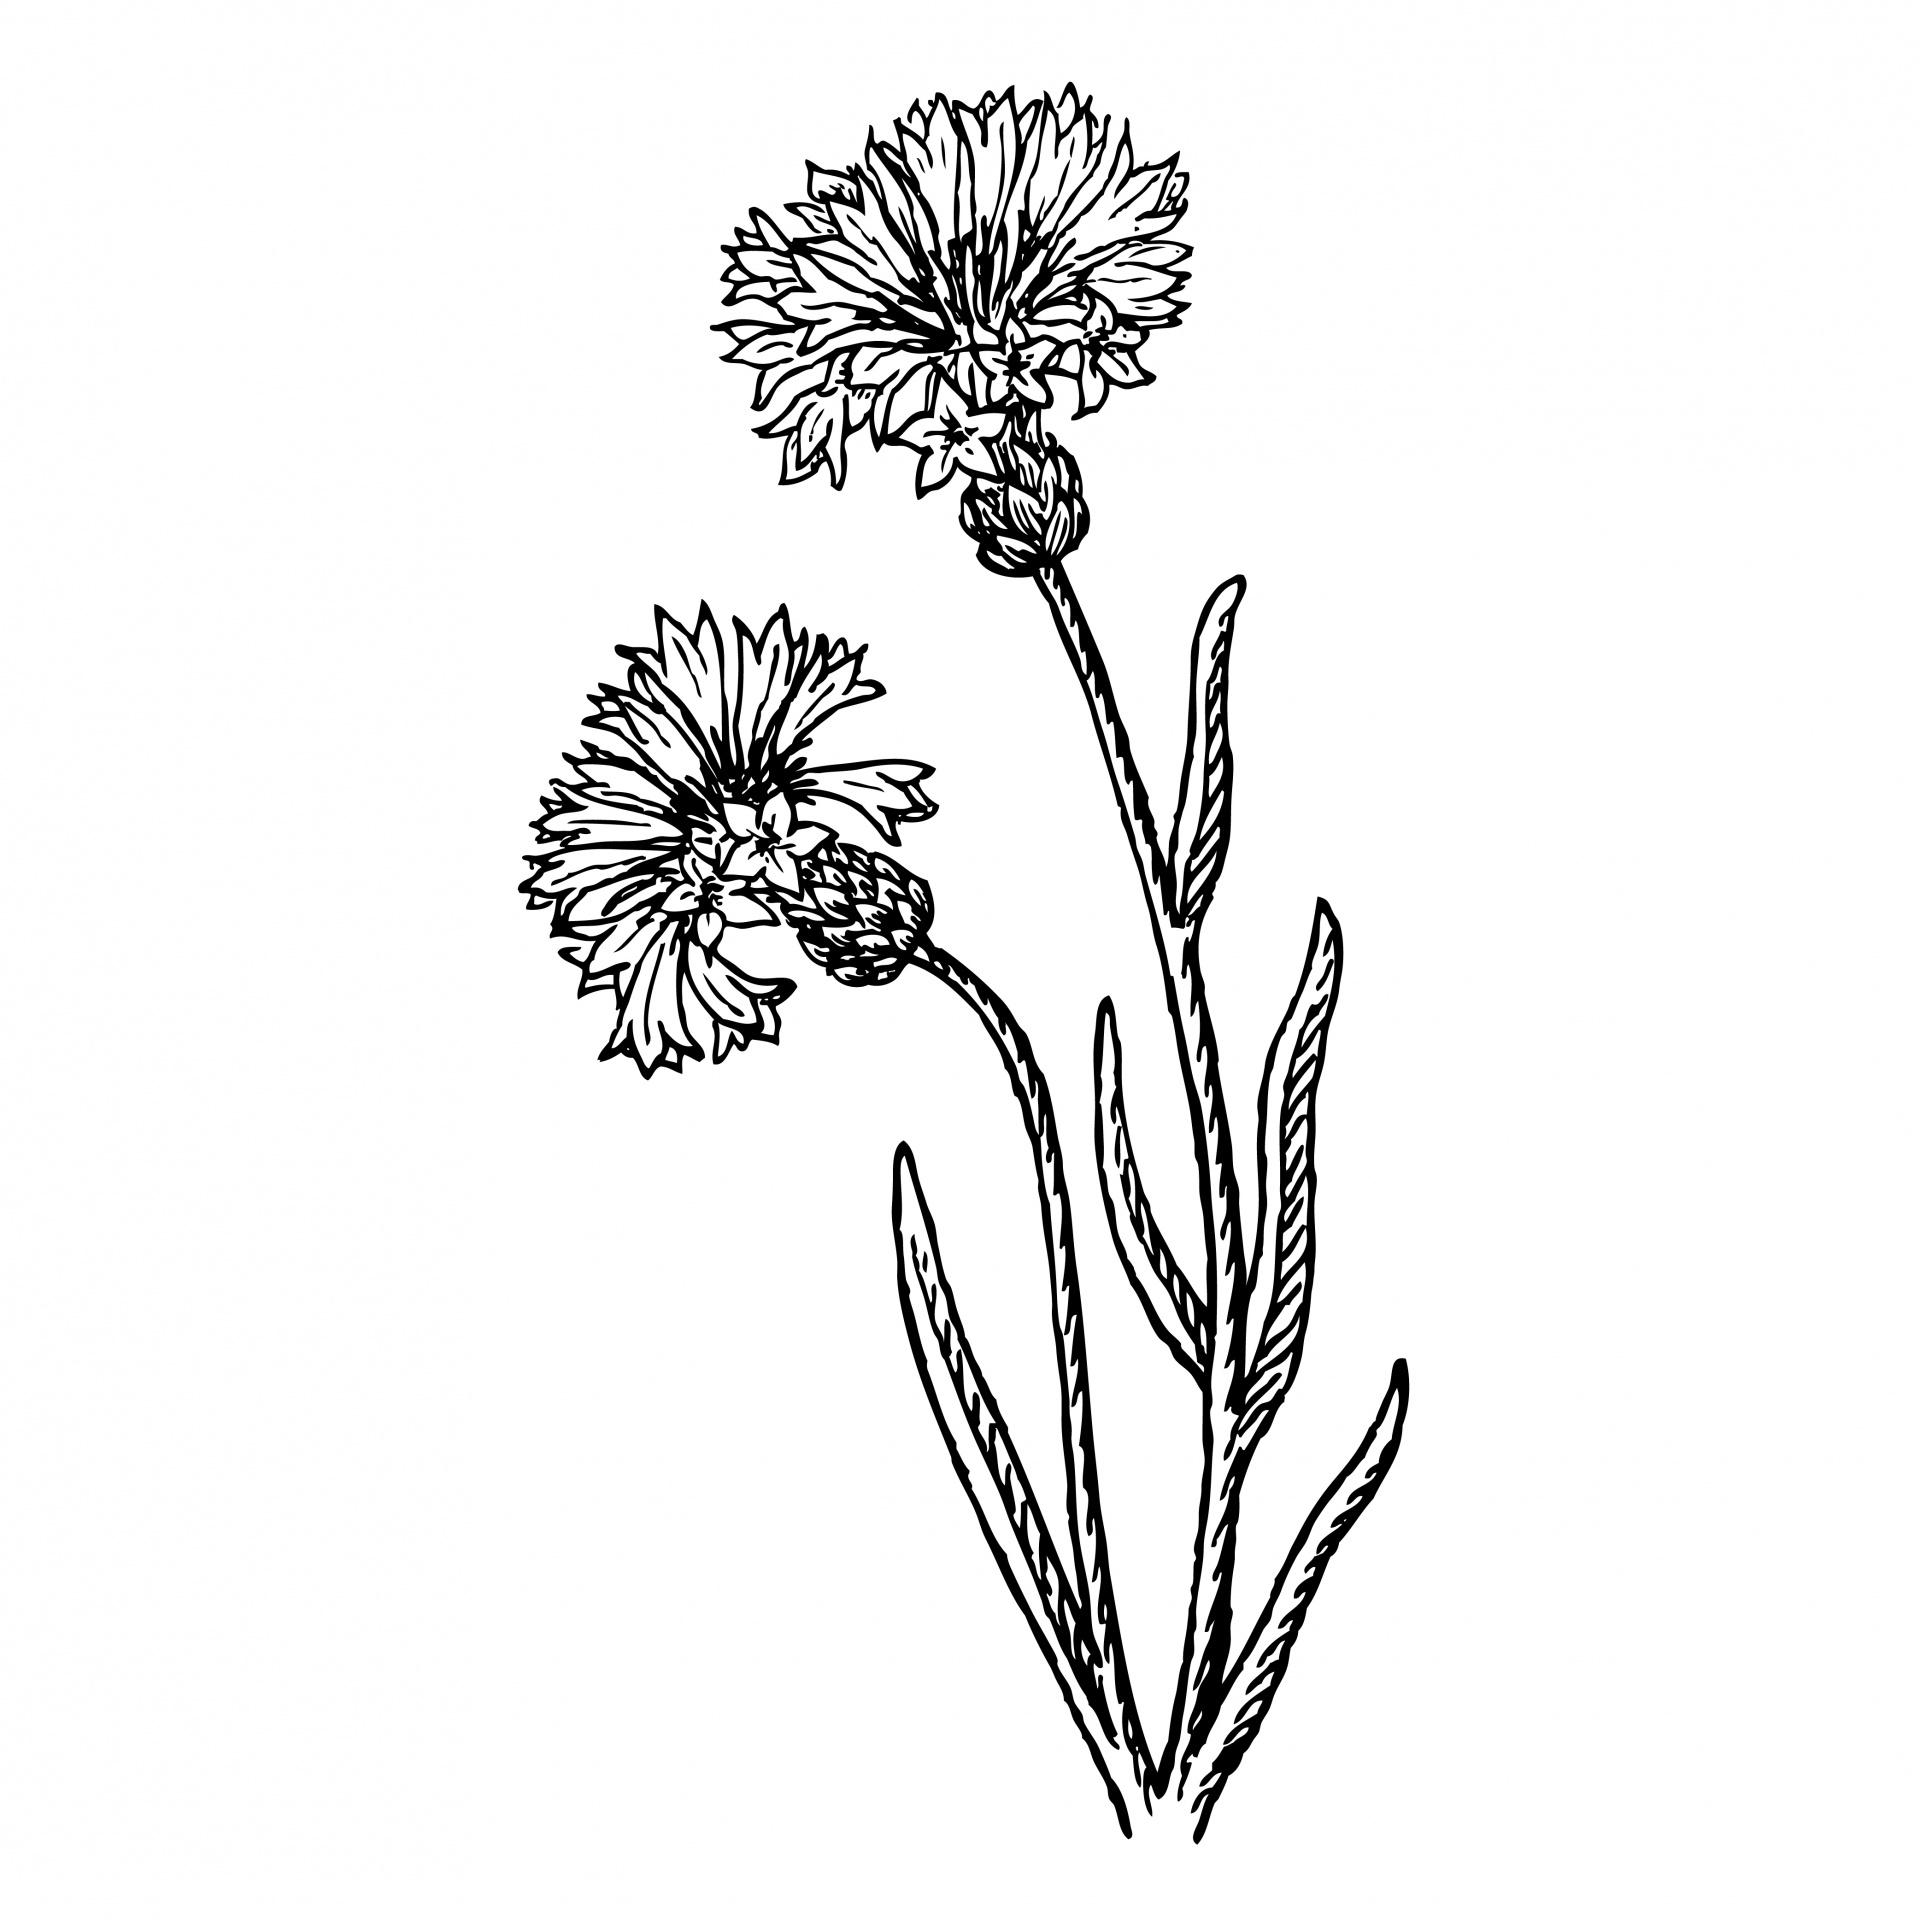 Flowers Clipart Illustration Free Stock Photo